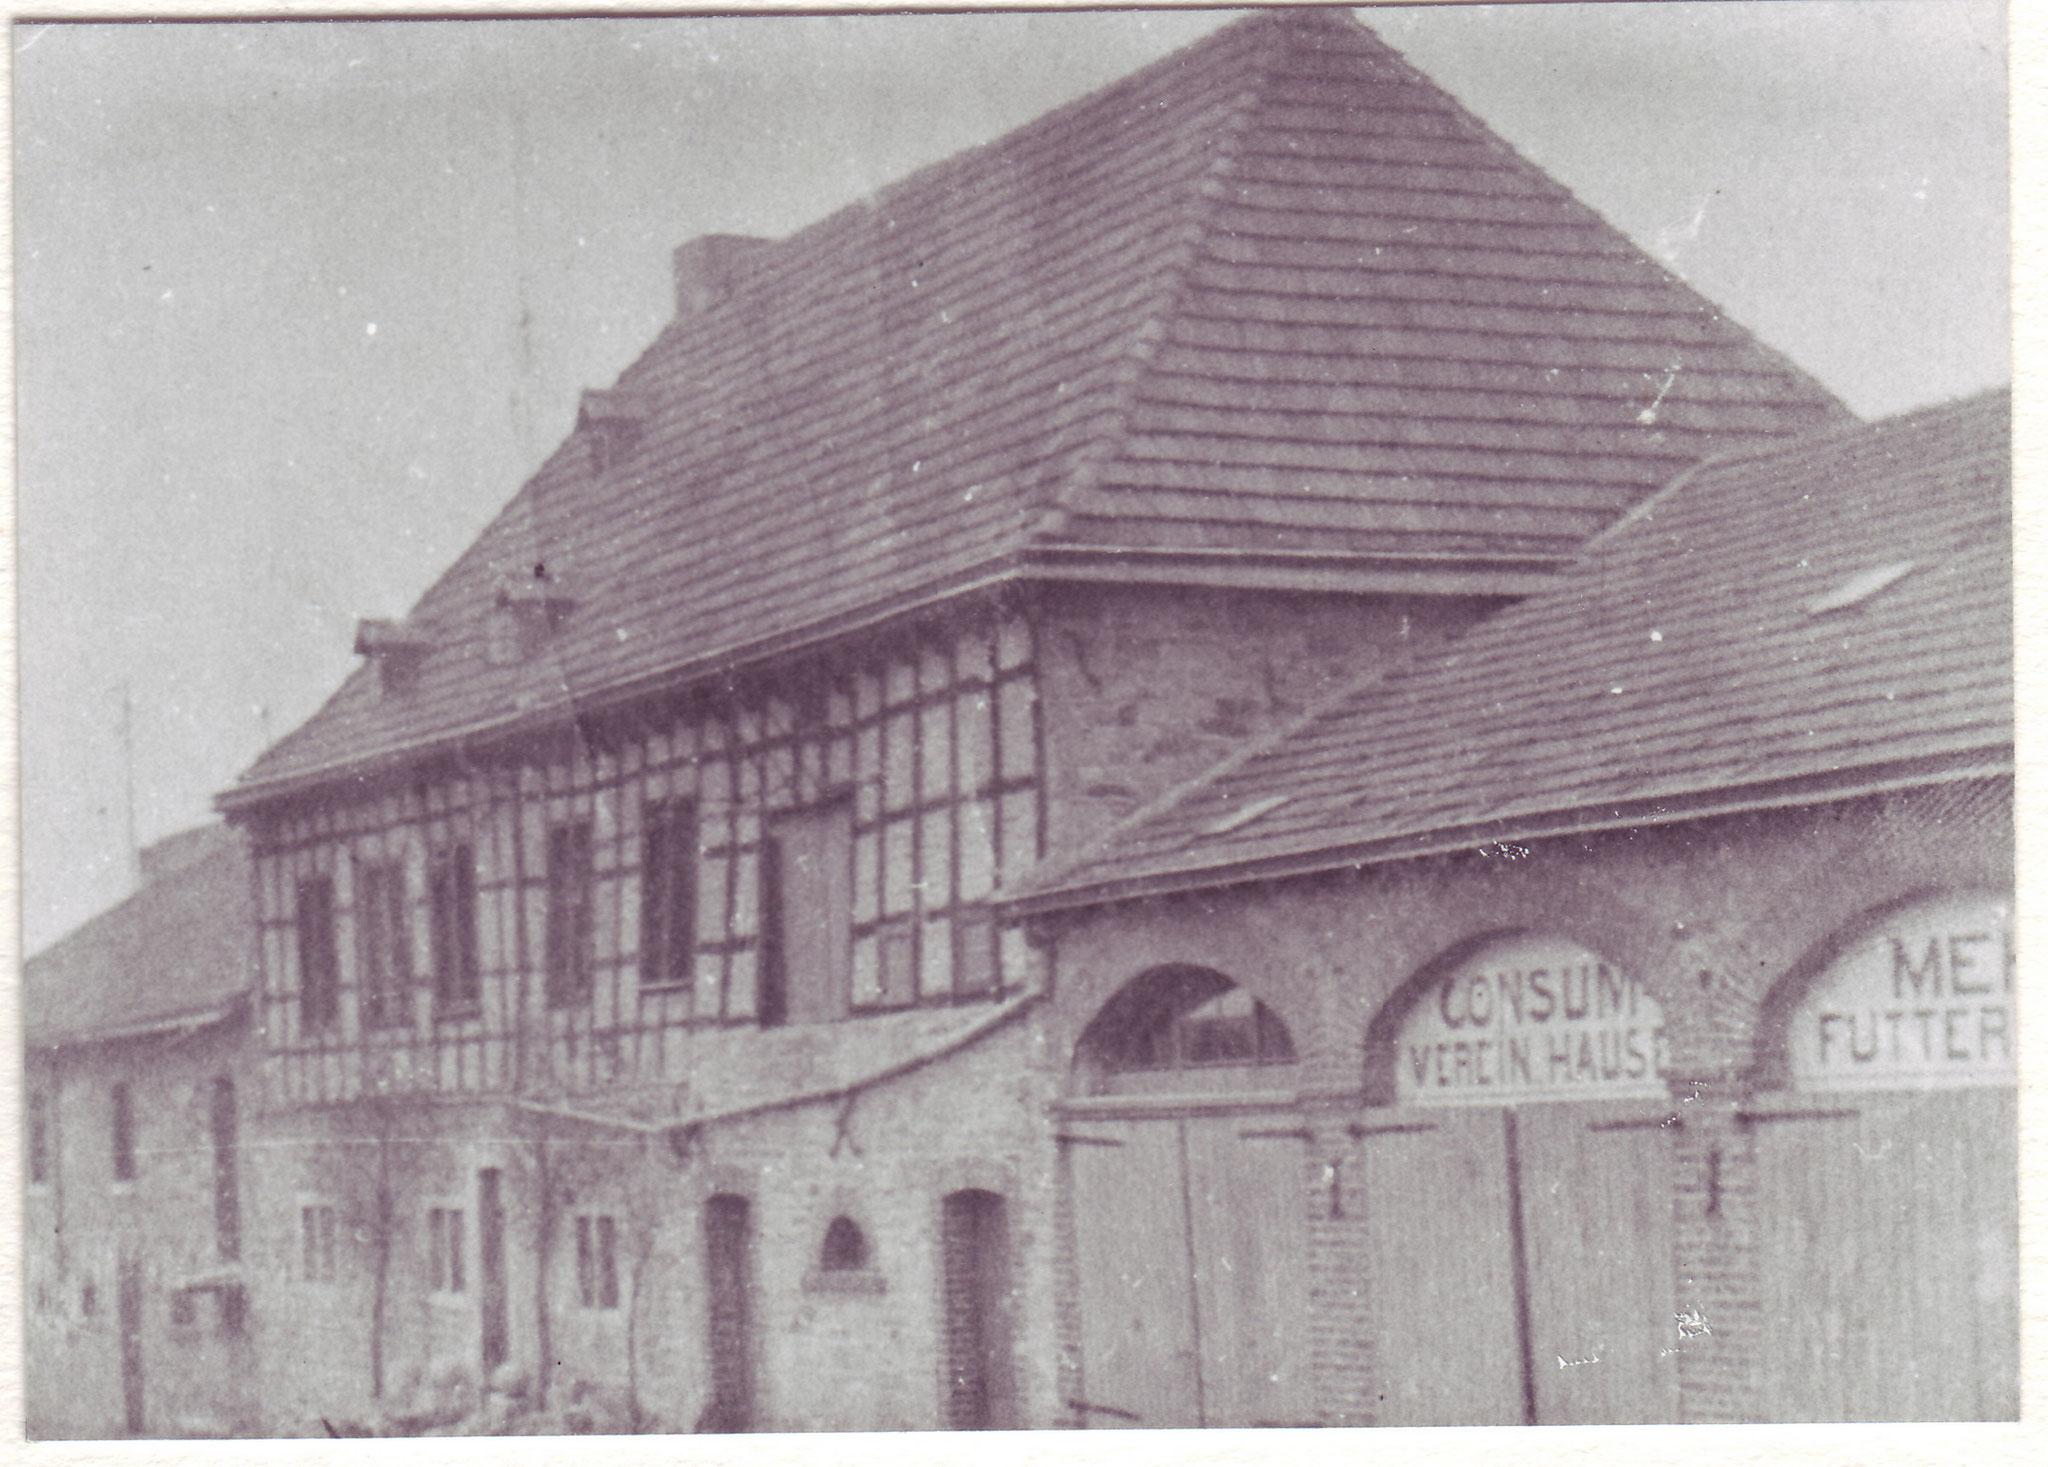 Gut Großhaus Consumverein 1911